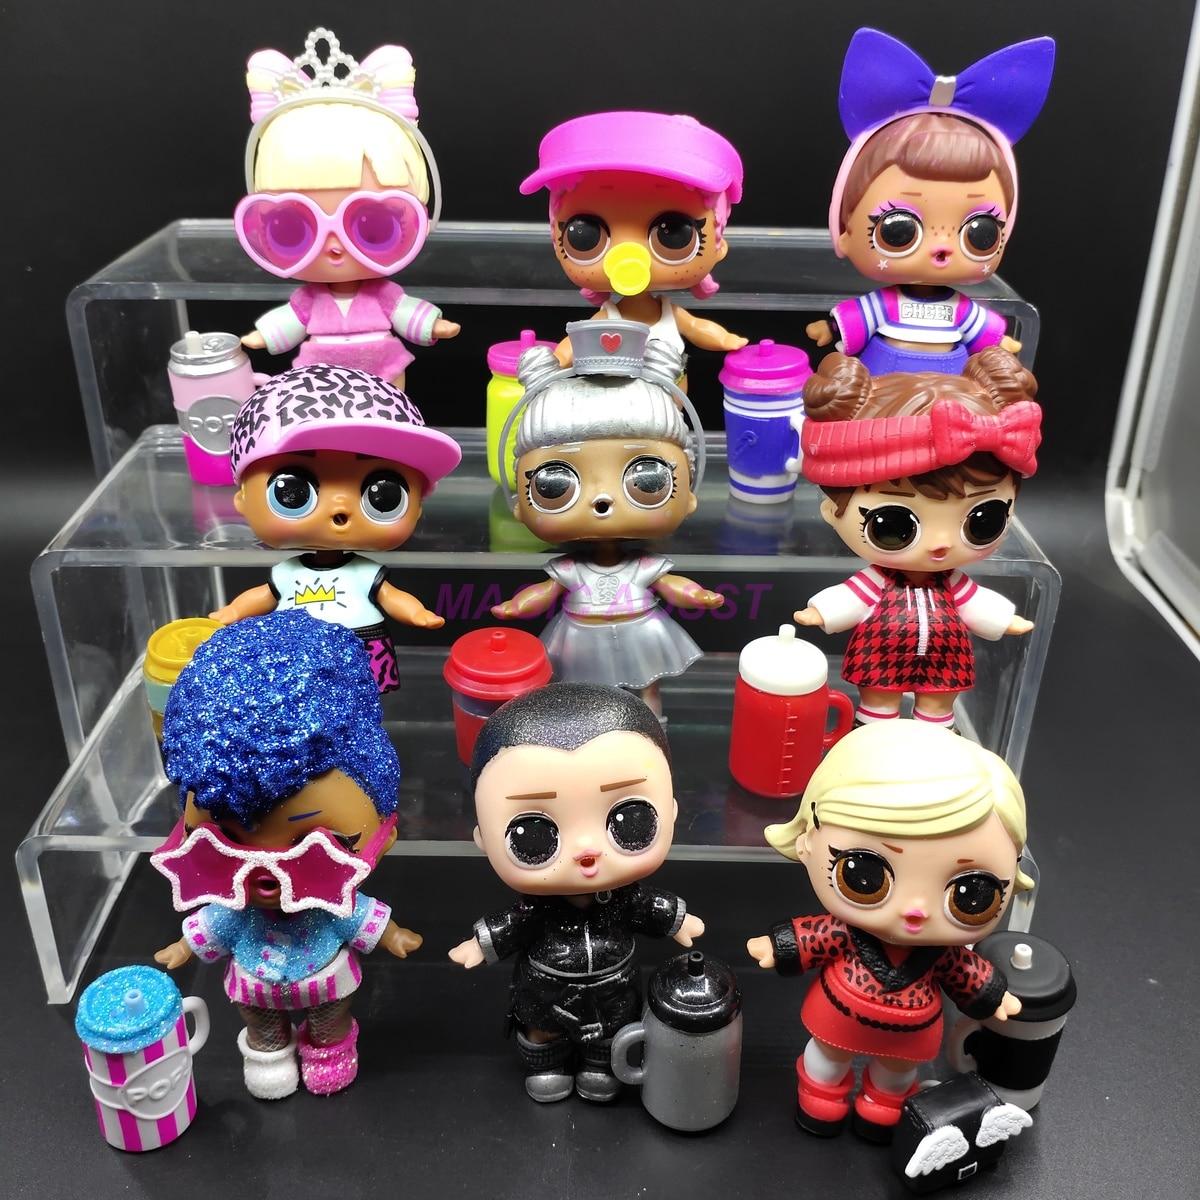 LOL Doll Surprise Original Four Generation Official Distribution Children's Toys Dolls Action Figure Model Girl Christmas Gift